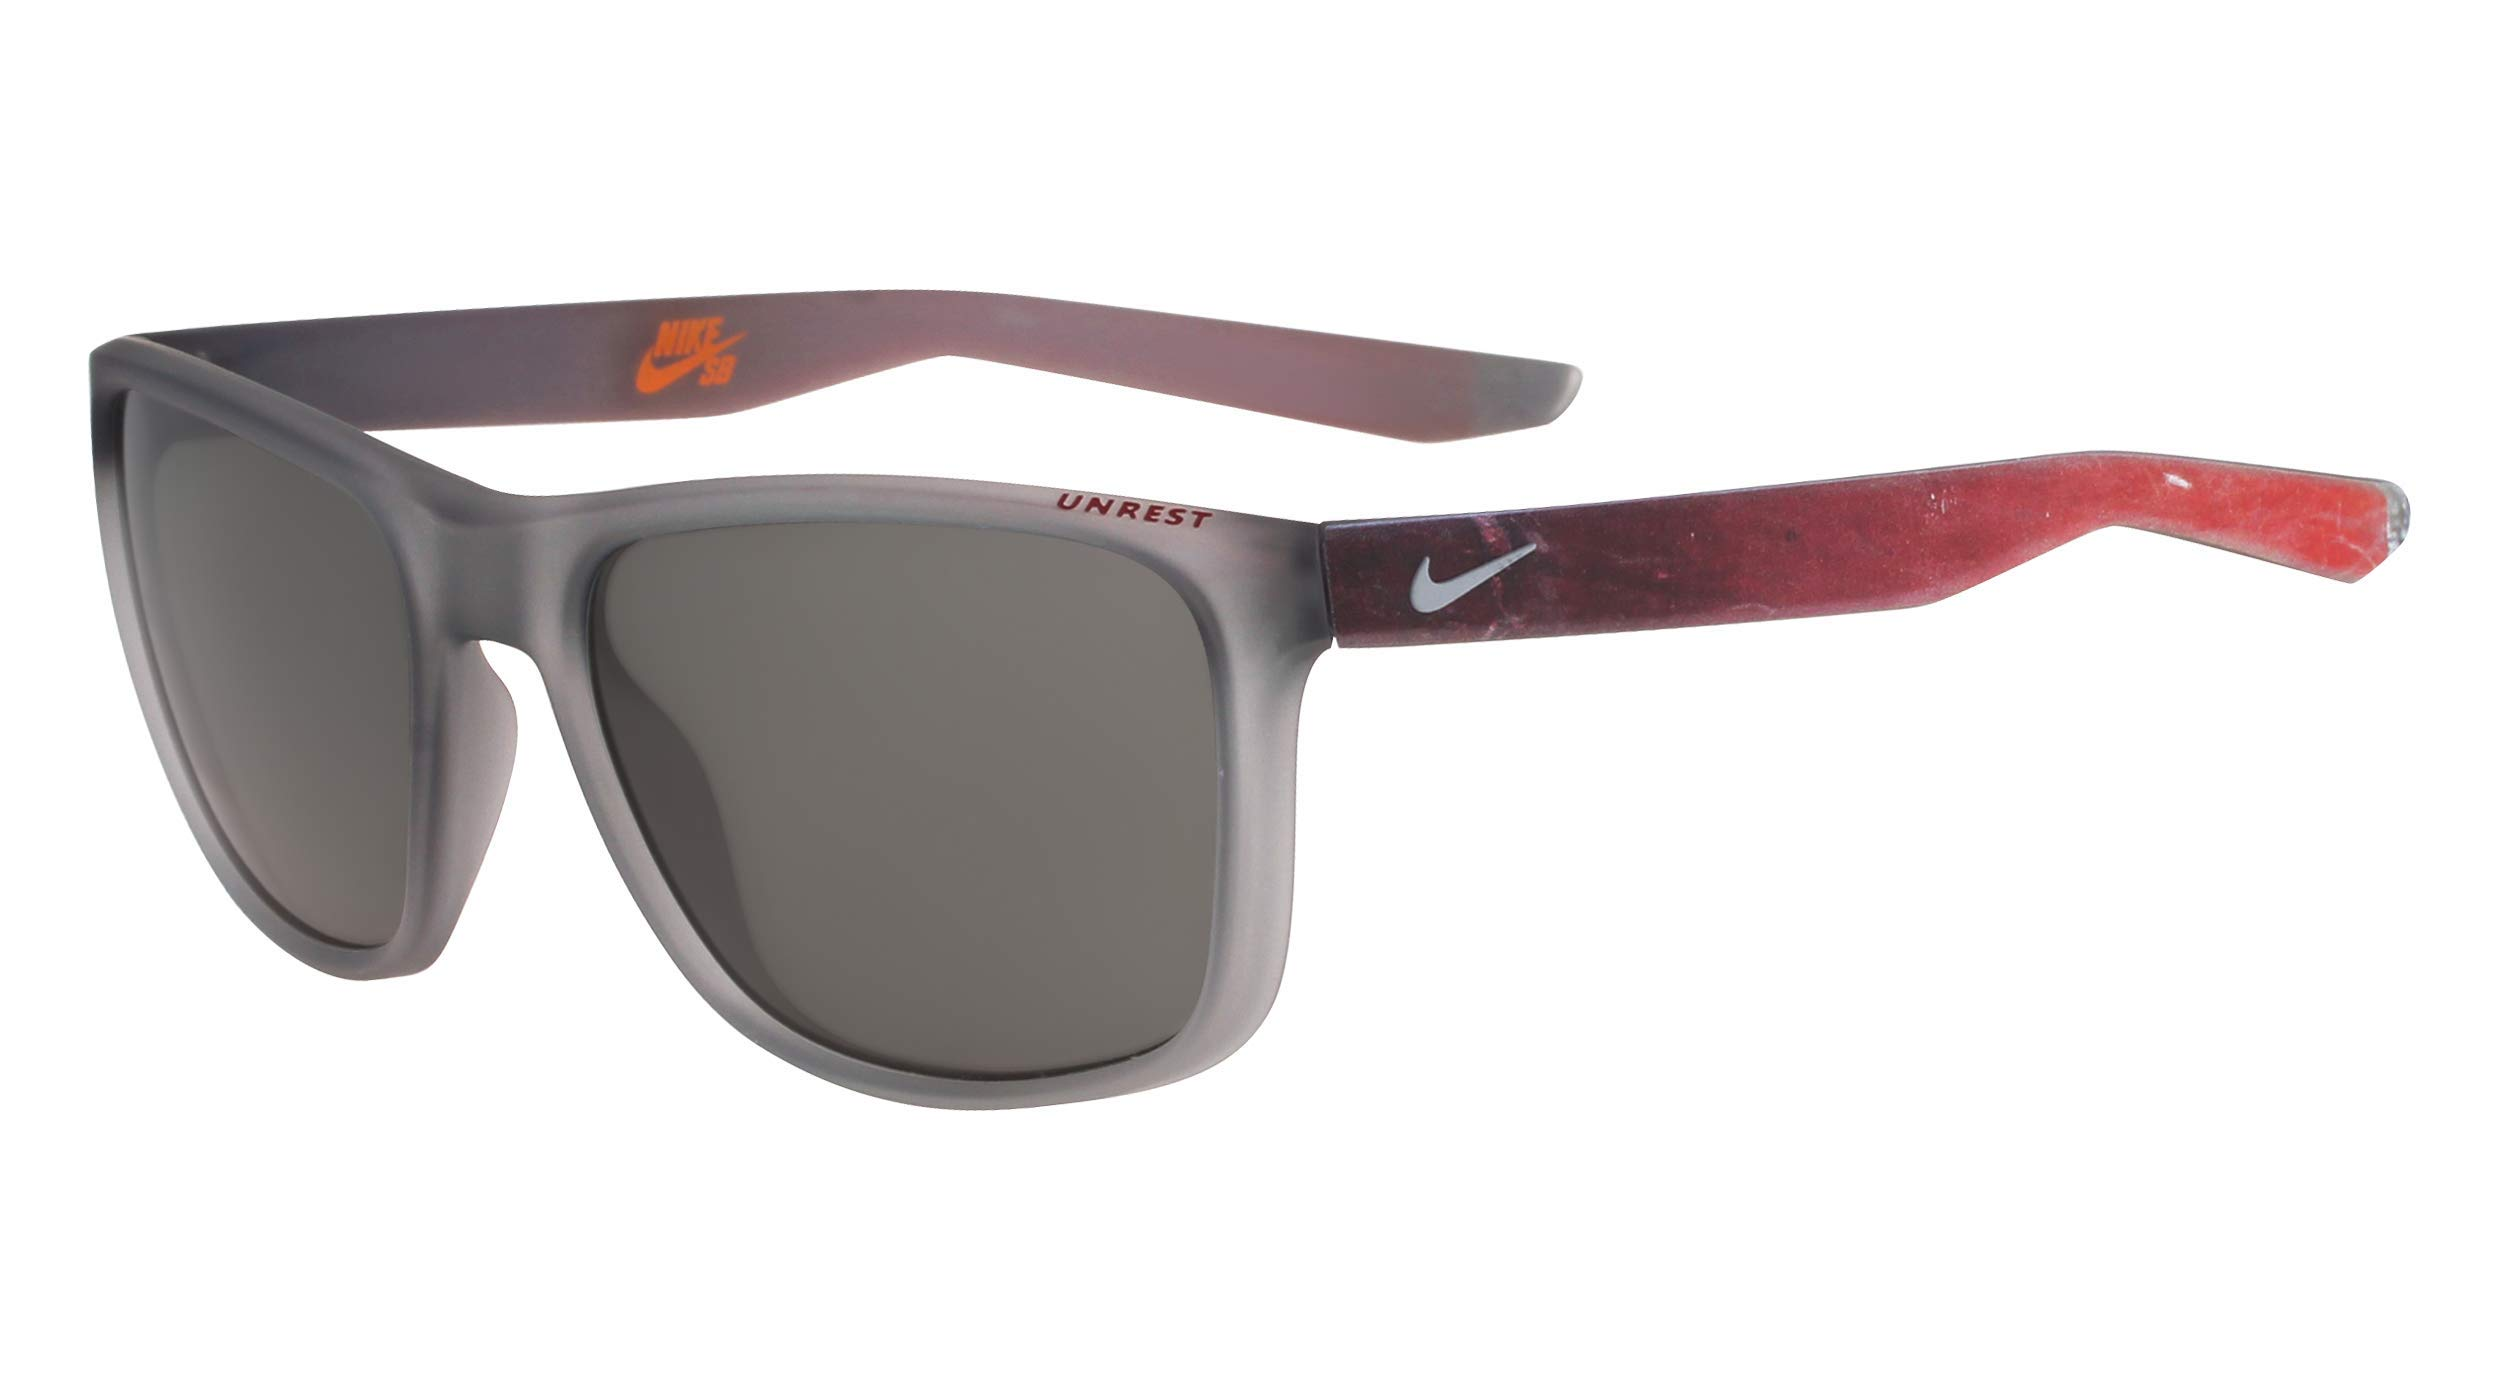 Nike Golf Men's Unrest Se Rectangular Sunglasses, Matte Wolf Grey/Gym Red Frame, 57 mm